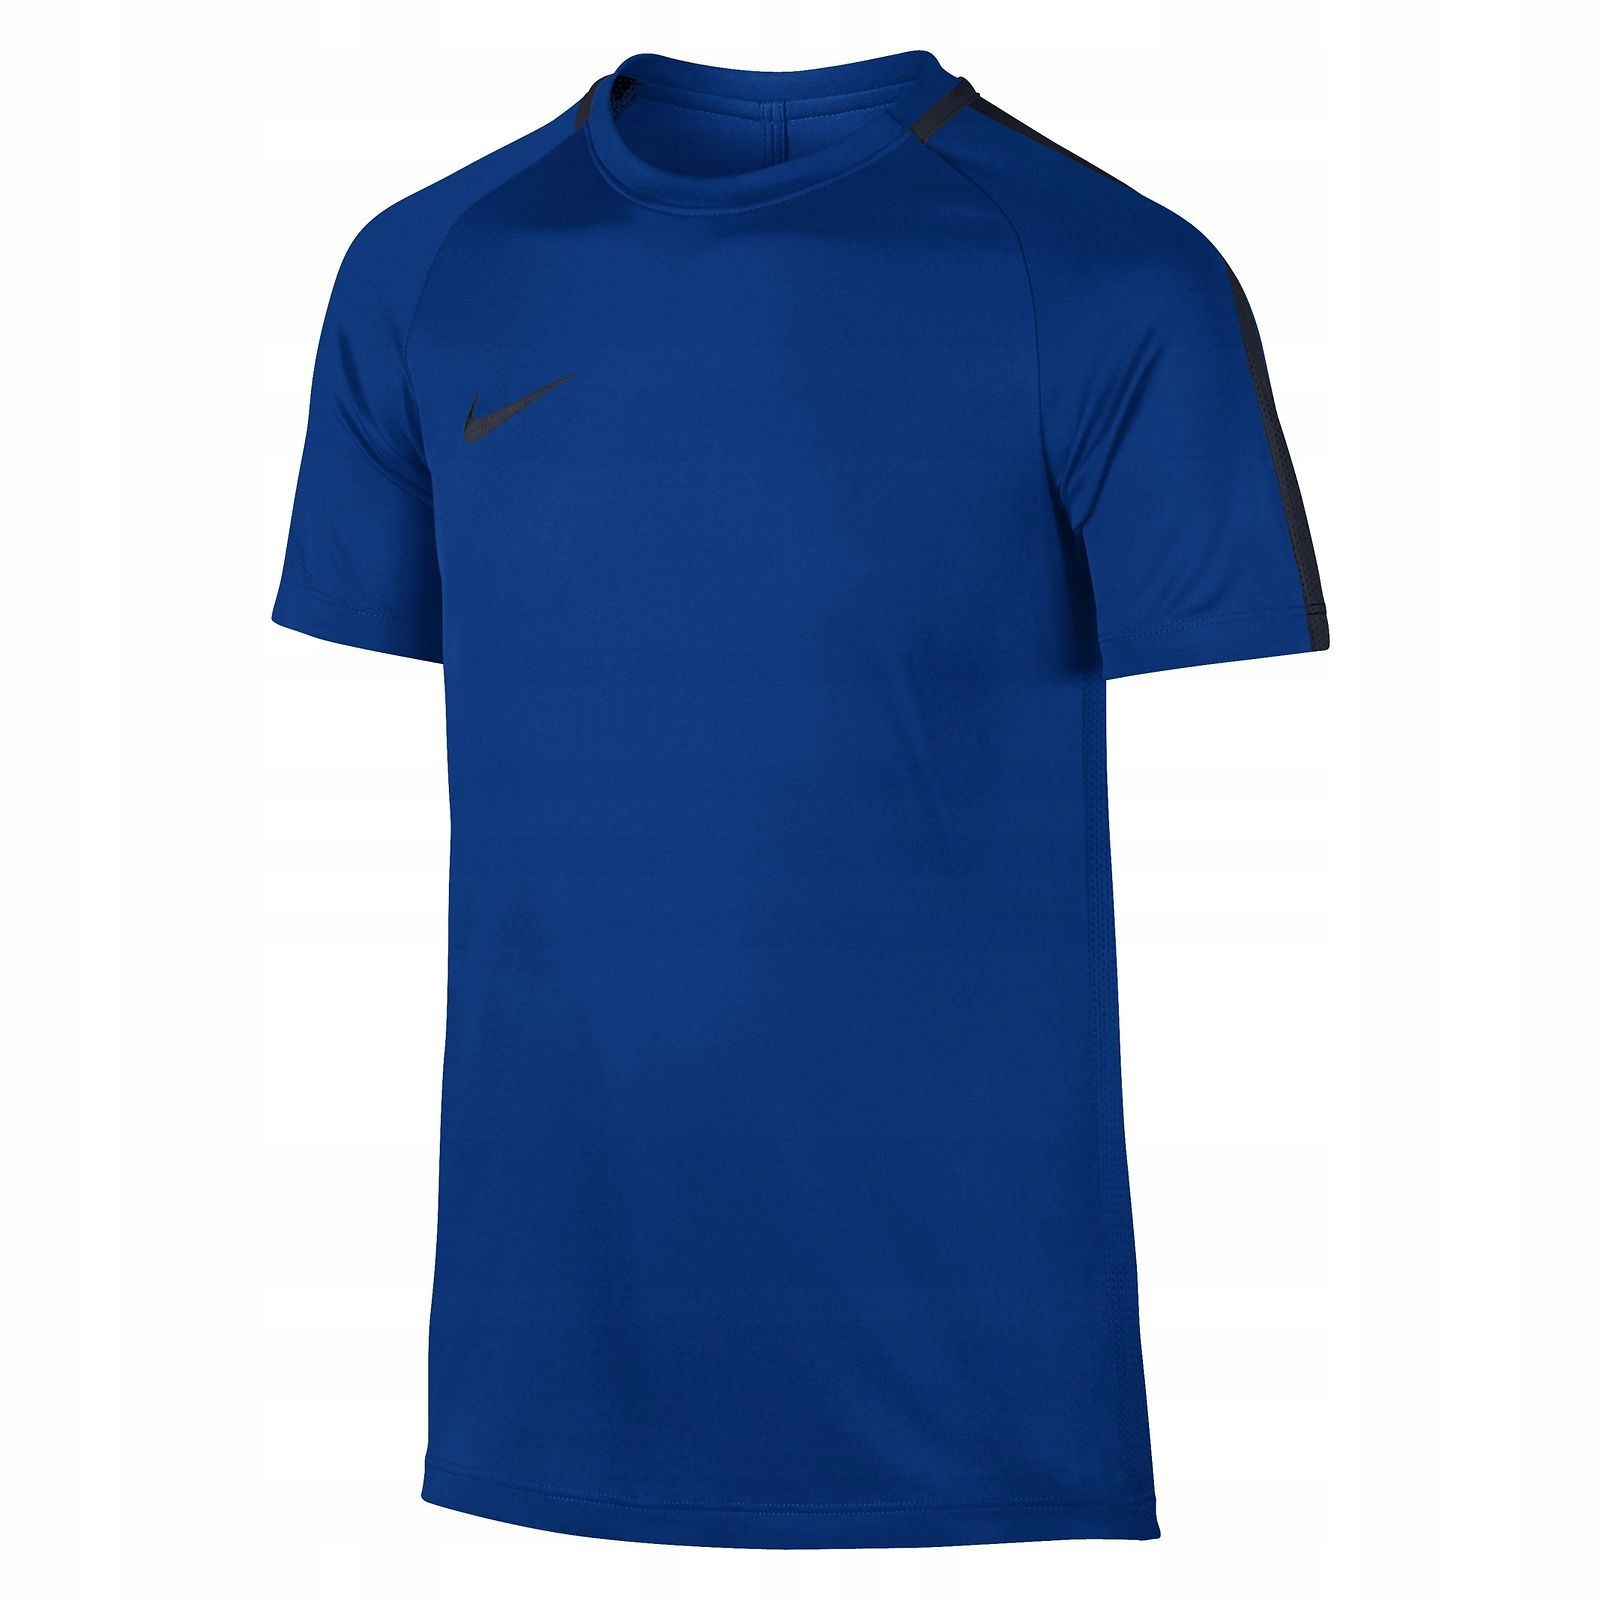 Juniorska koszulka piłkarska Nike Academy r.L